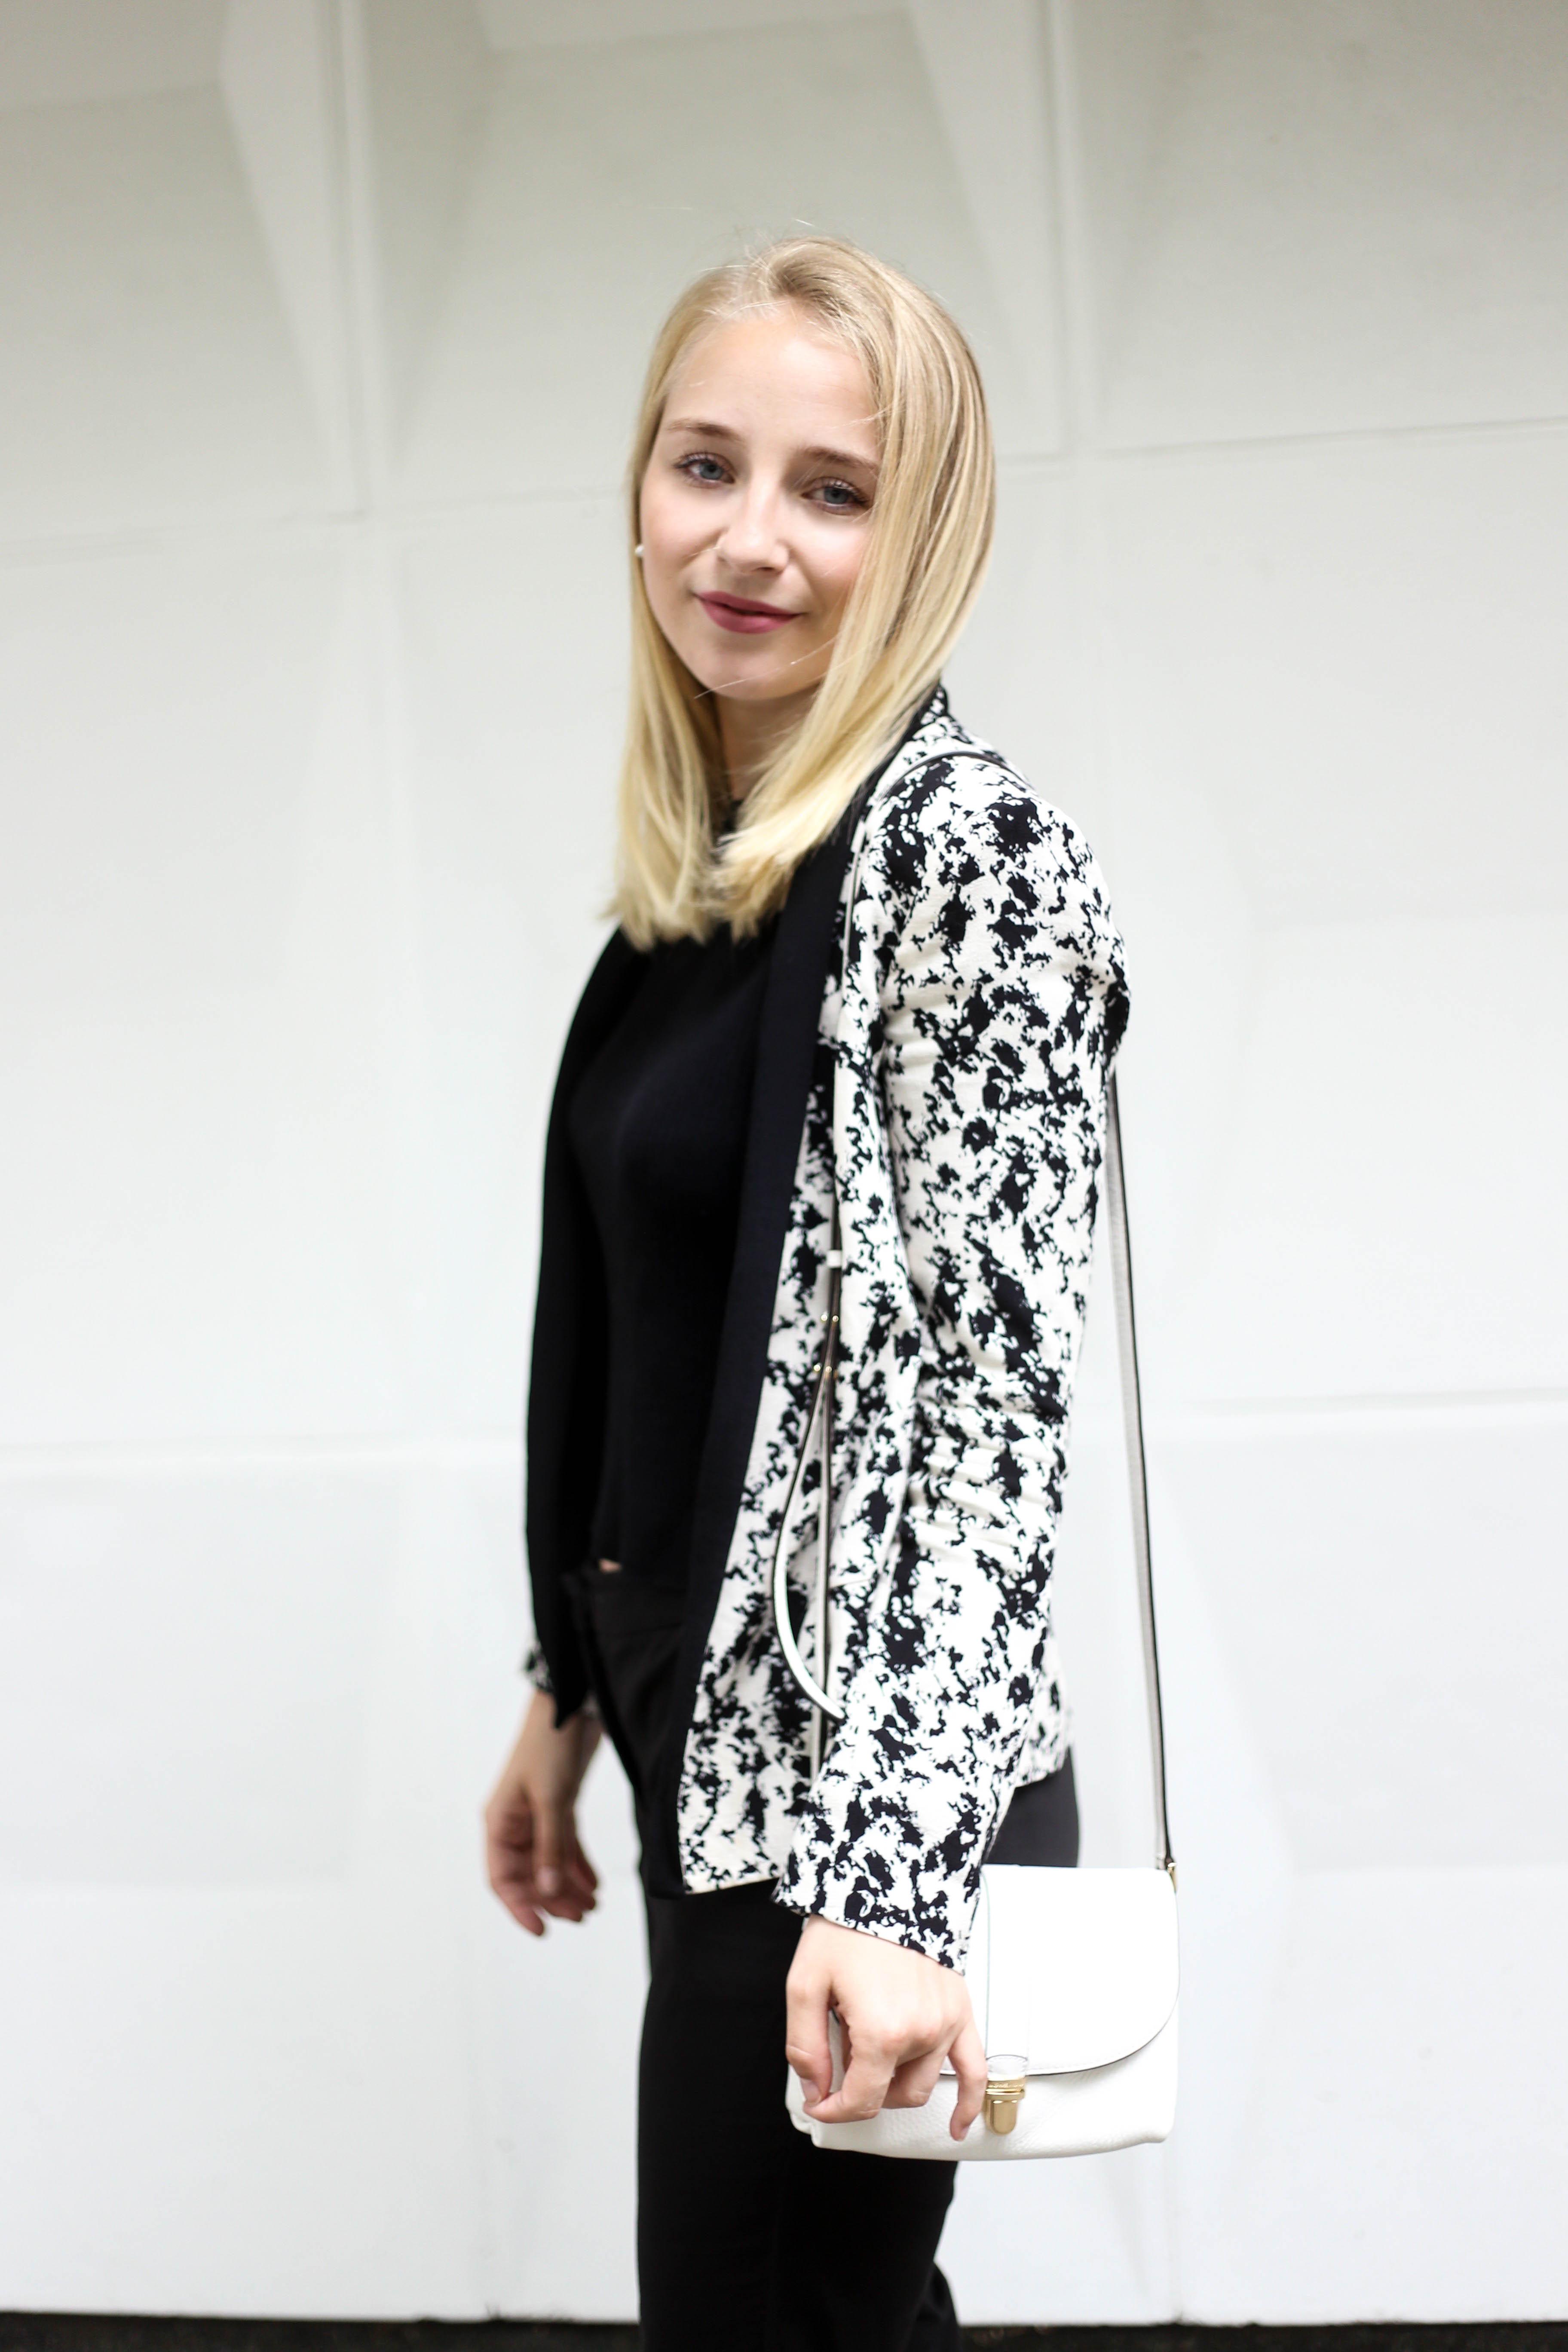 anzugshose-alltag-dalmatiner-blazer-outfit-fashionblog-berlin-köln_1997